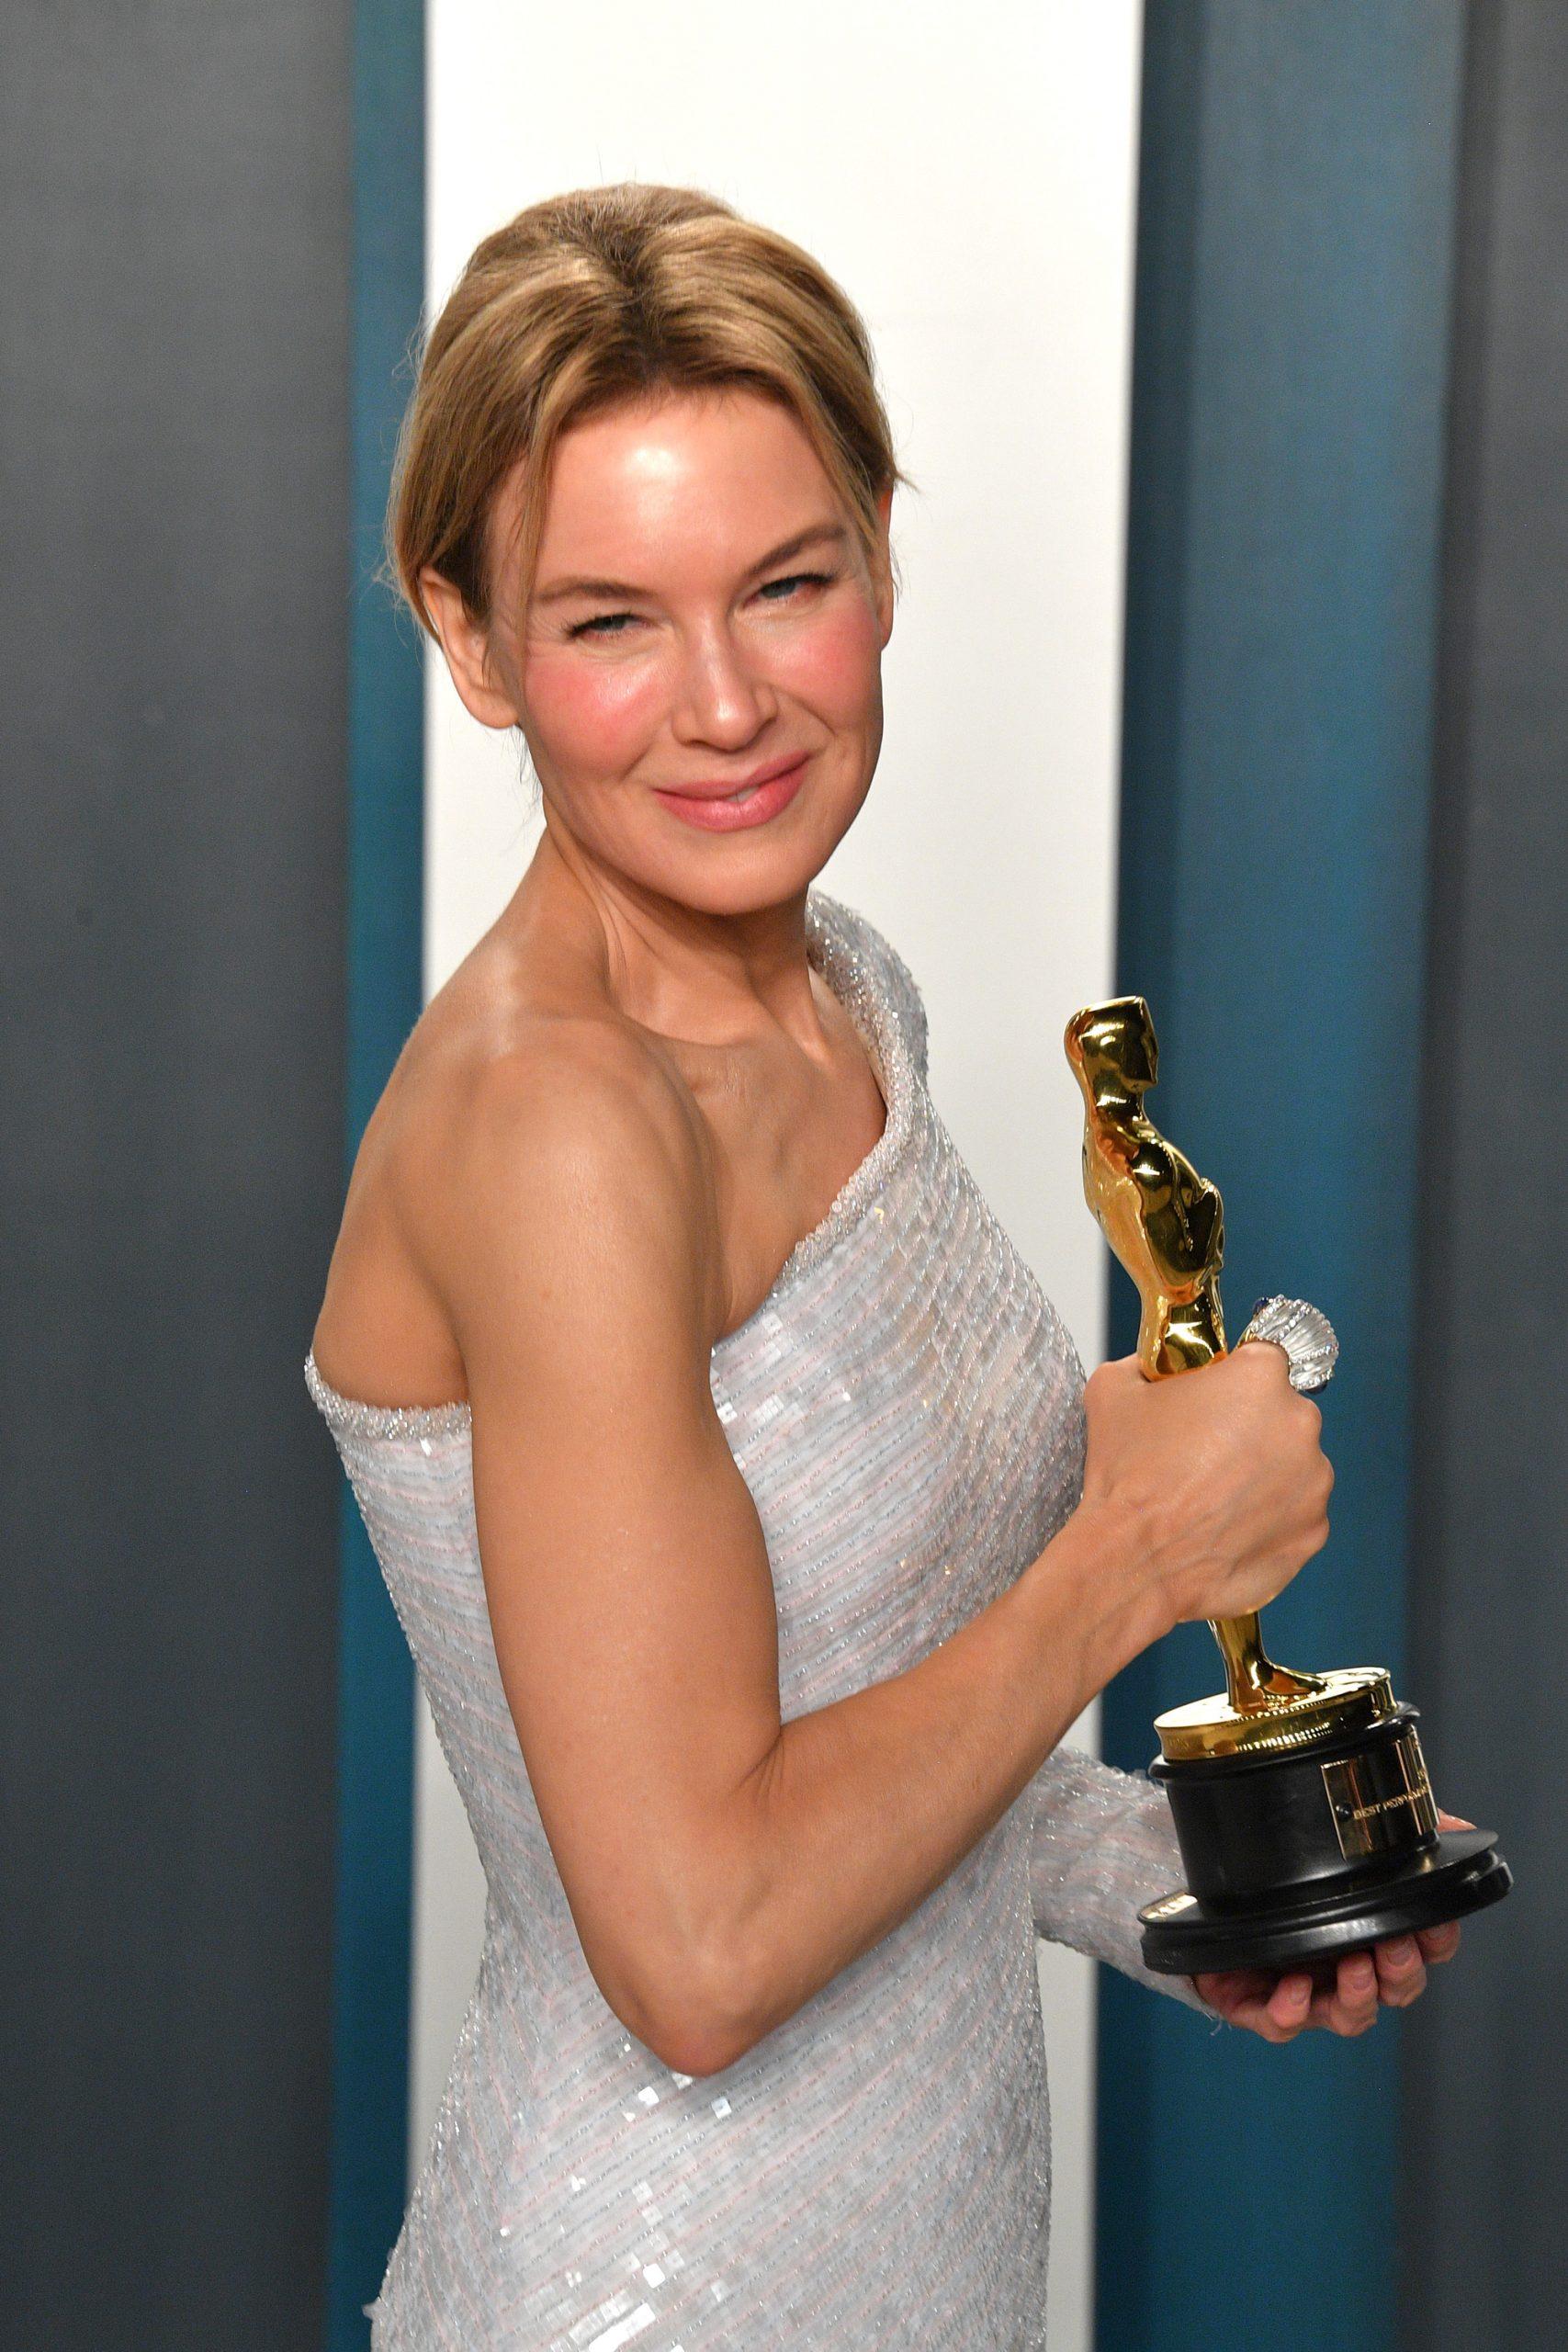 renee zellweger best actress oscar judy